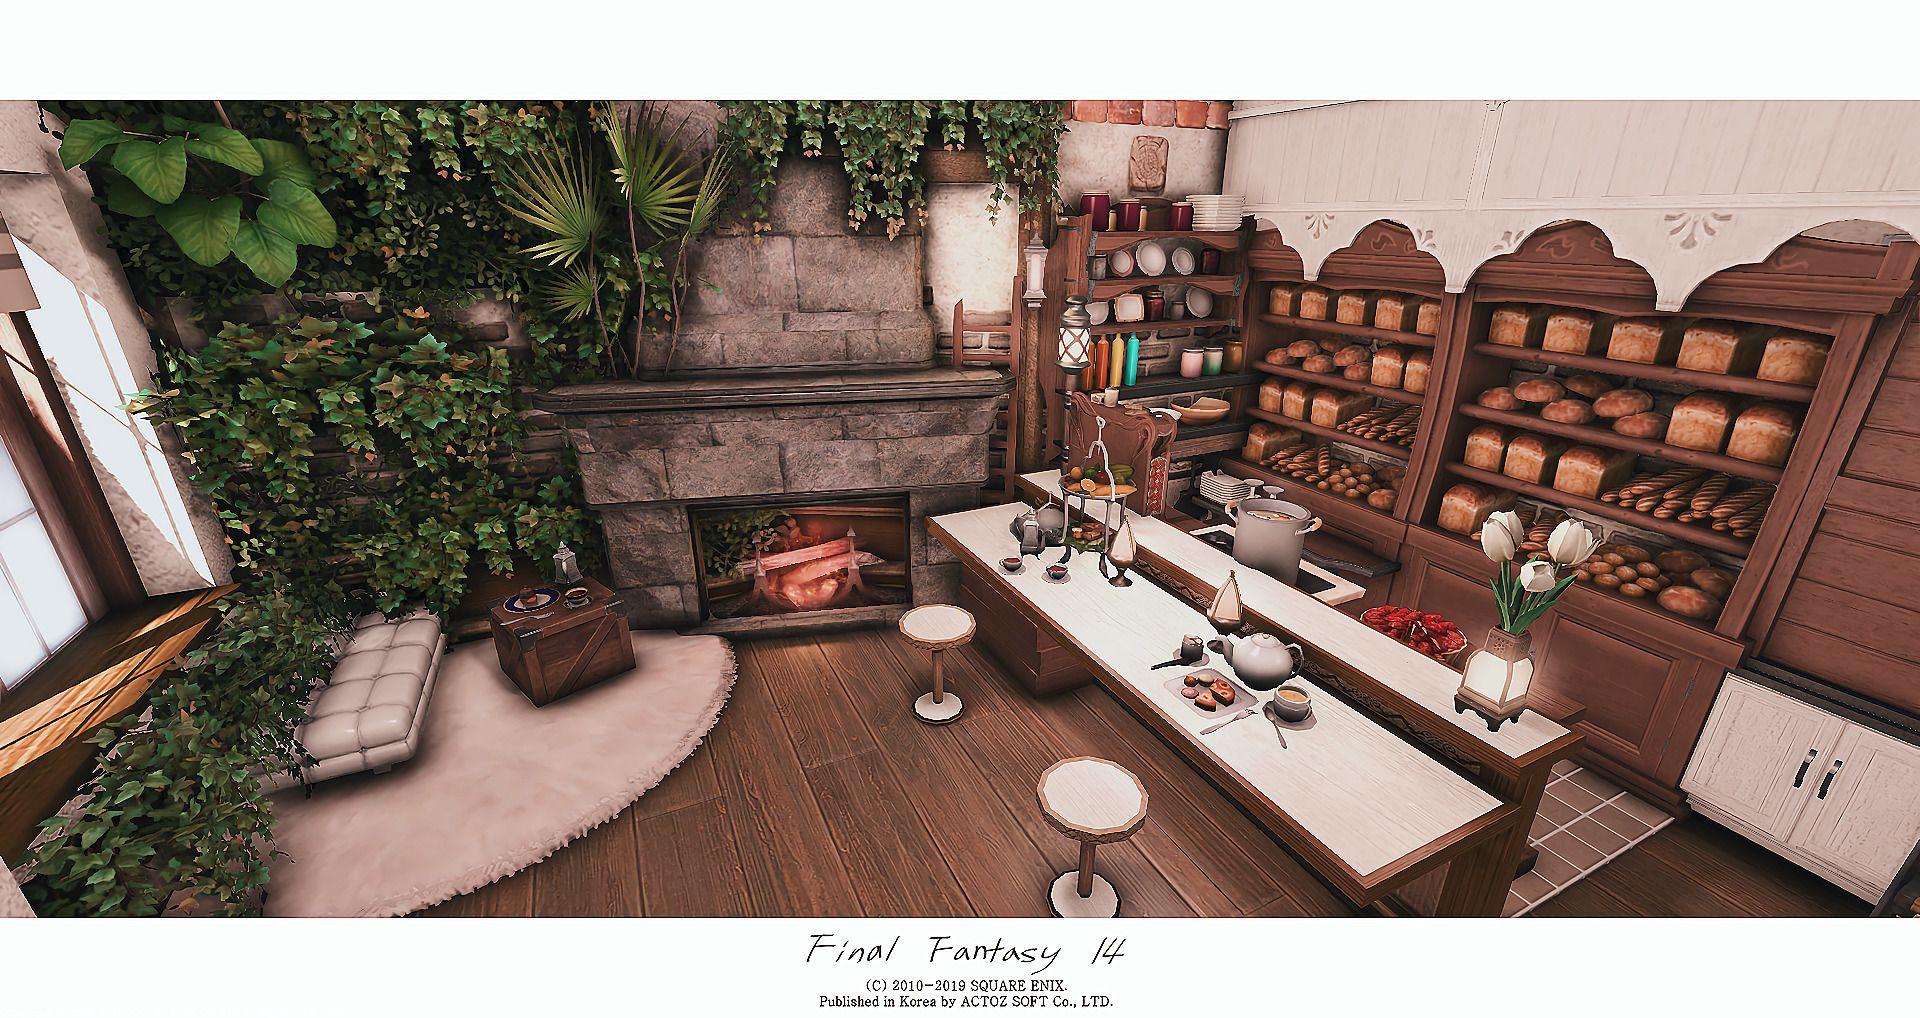 360 Ffxiv Housing Ideas In 2021 Ff14 Final Fantasy 14 House